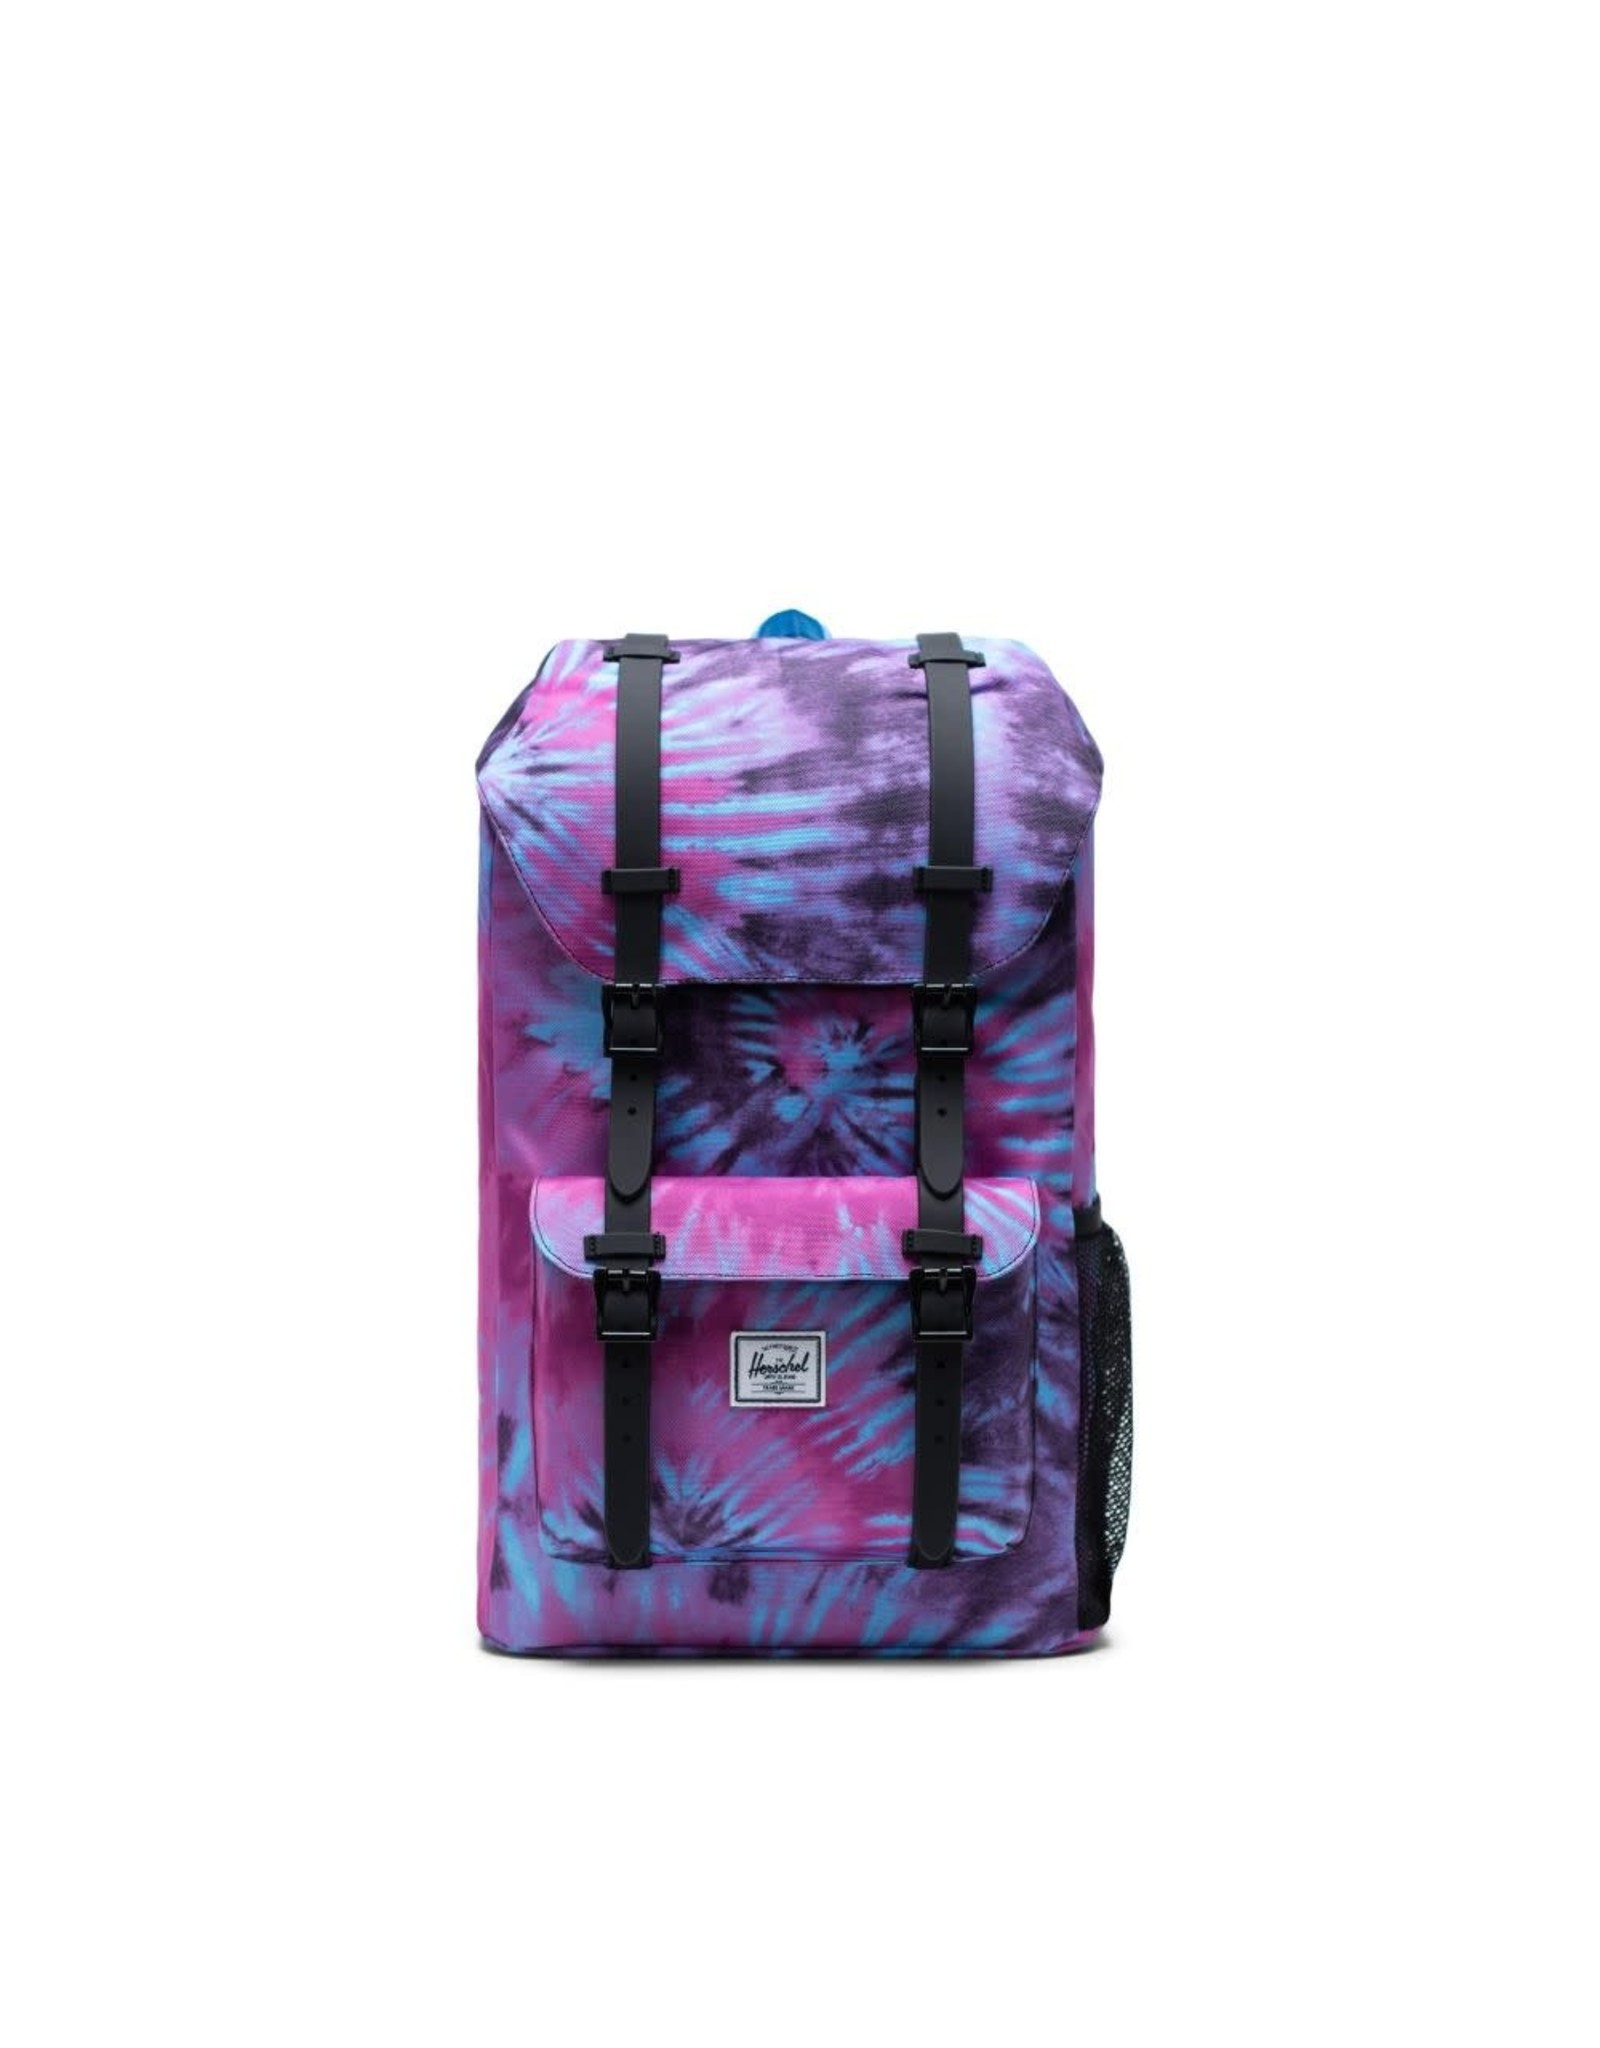 Herschel Supply Herschel Little America Youth Backpack, Black Tie Dye